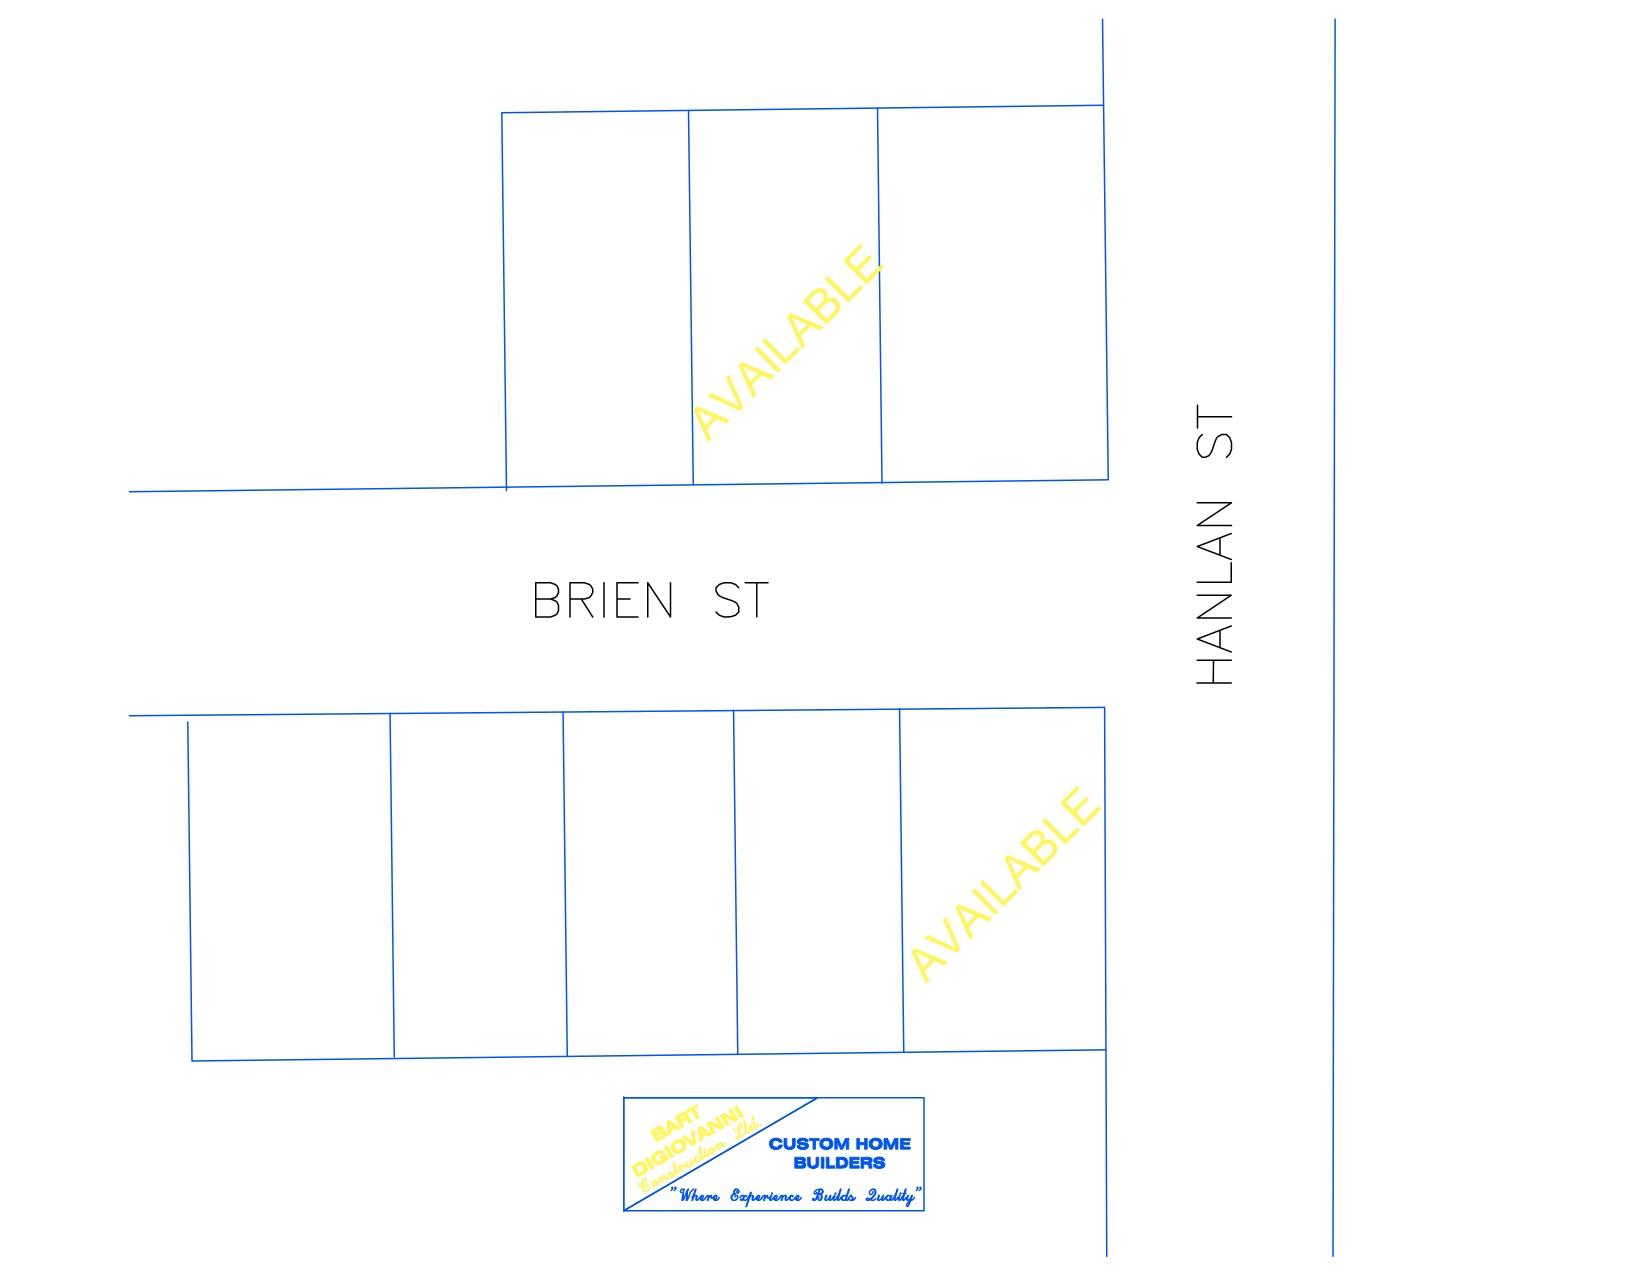 Brien St